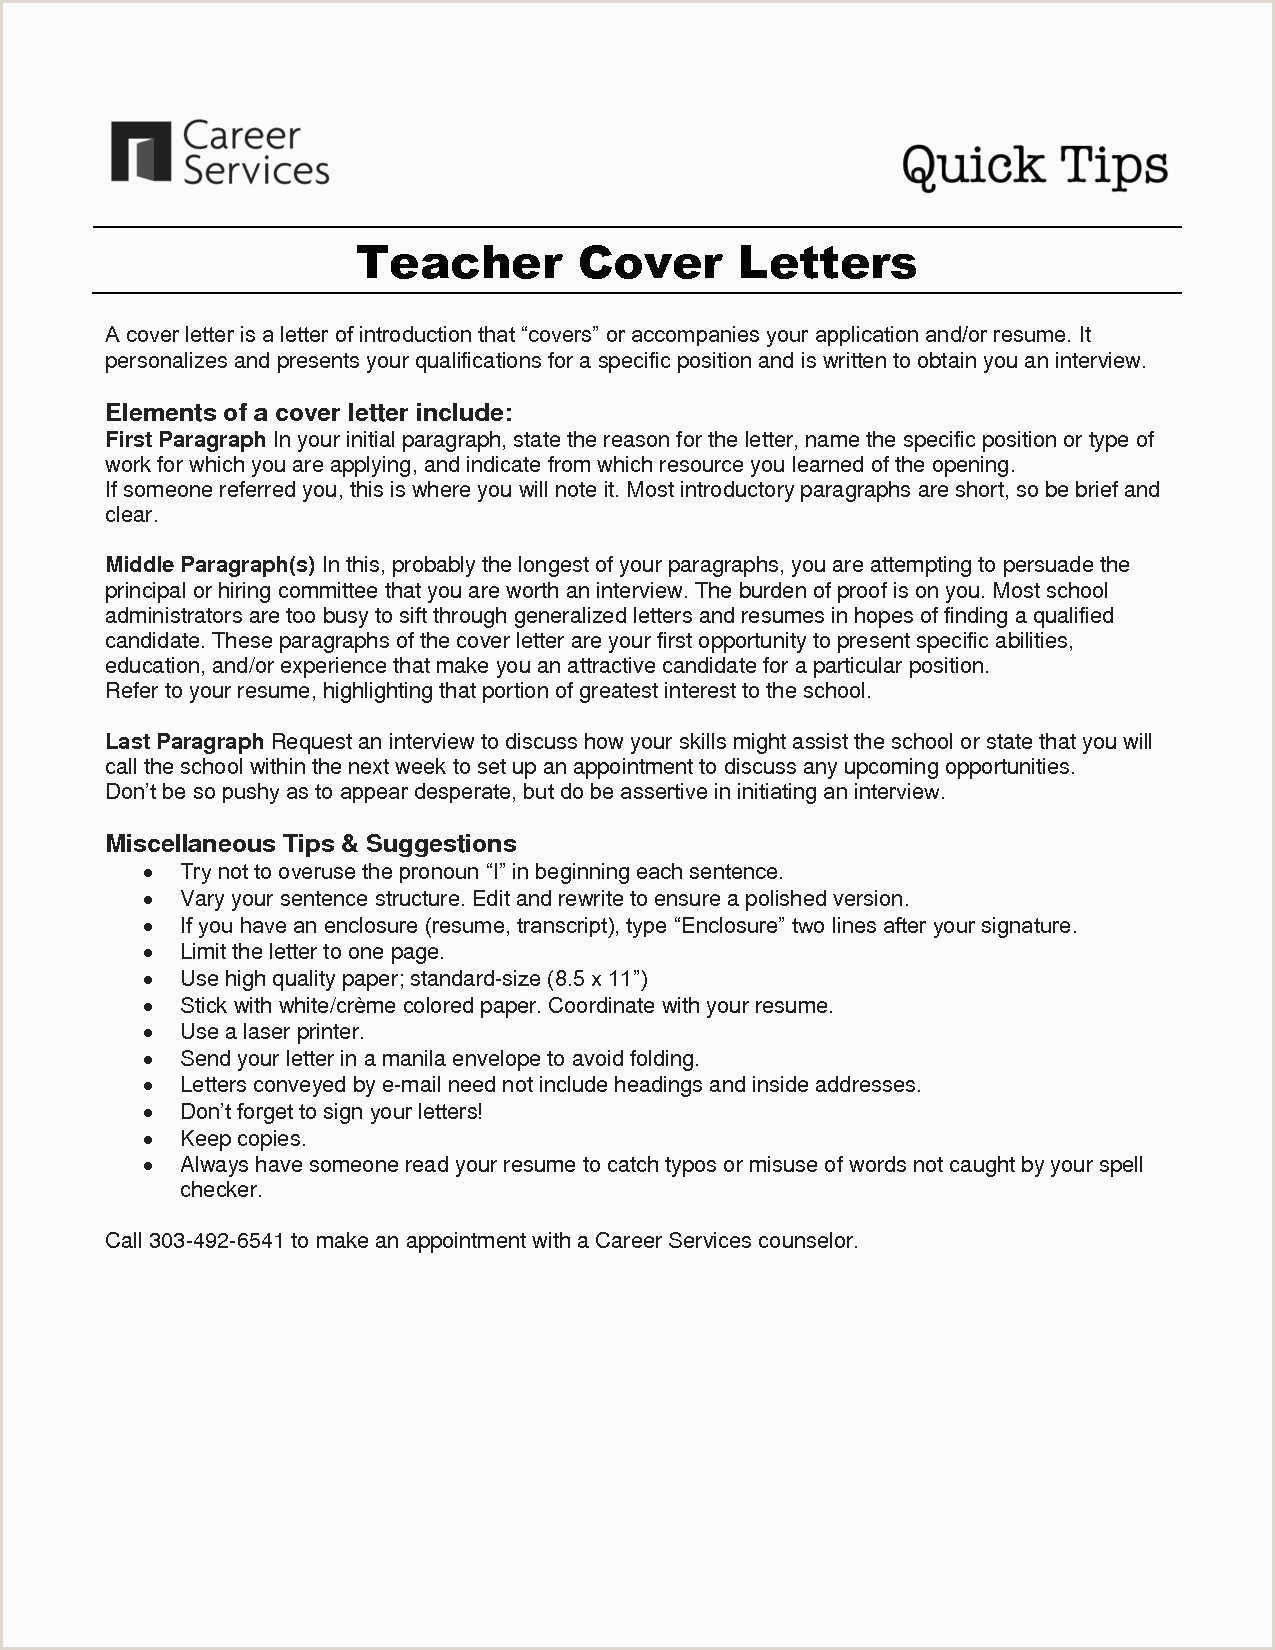 Call Center Resume format for Freshers Inspirational Resume format for Bpo Jobs for Freshers